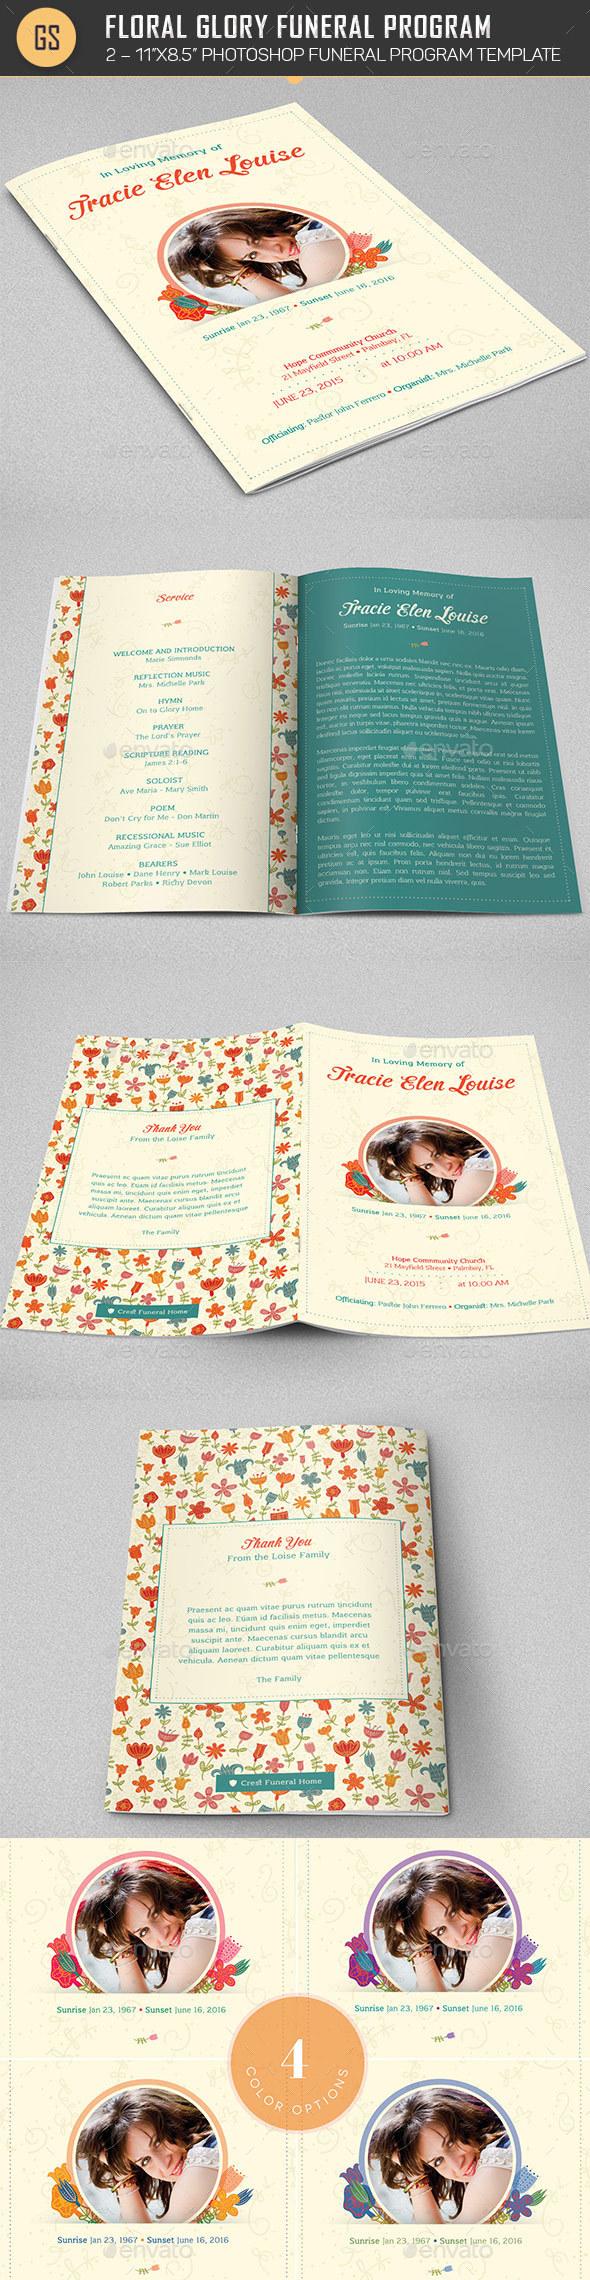 Floral Glory Funeral Program Template - Informational Brochures